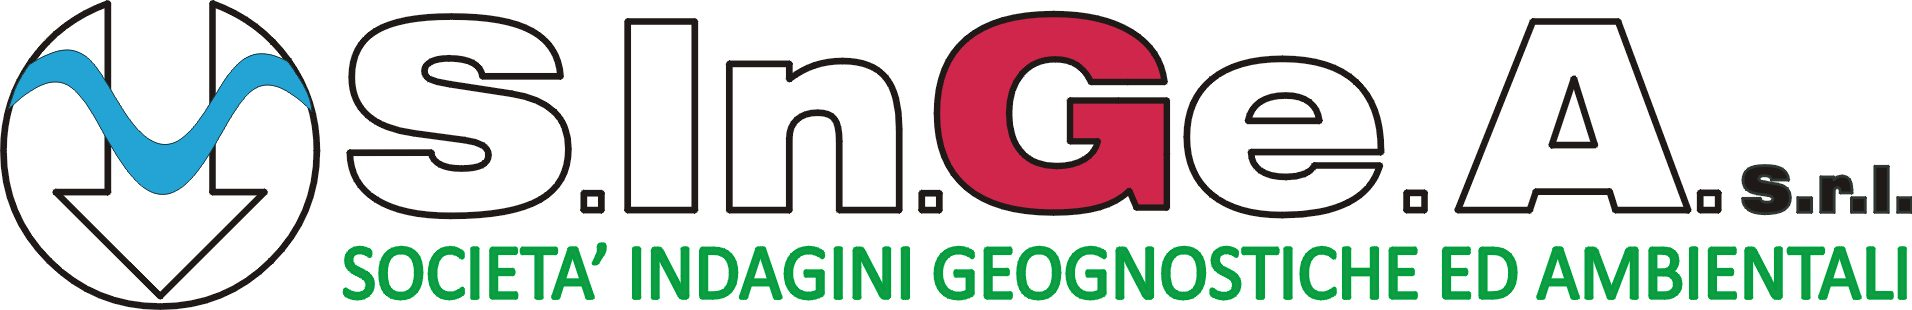 S.IN.GE.A-LOGO